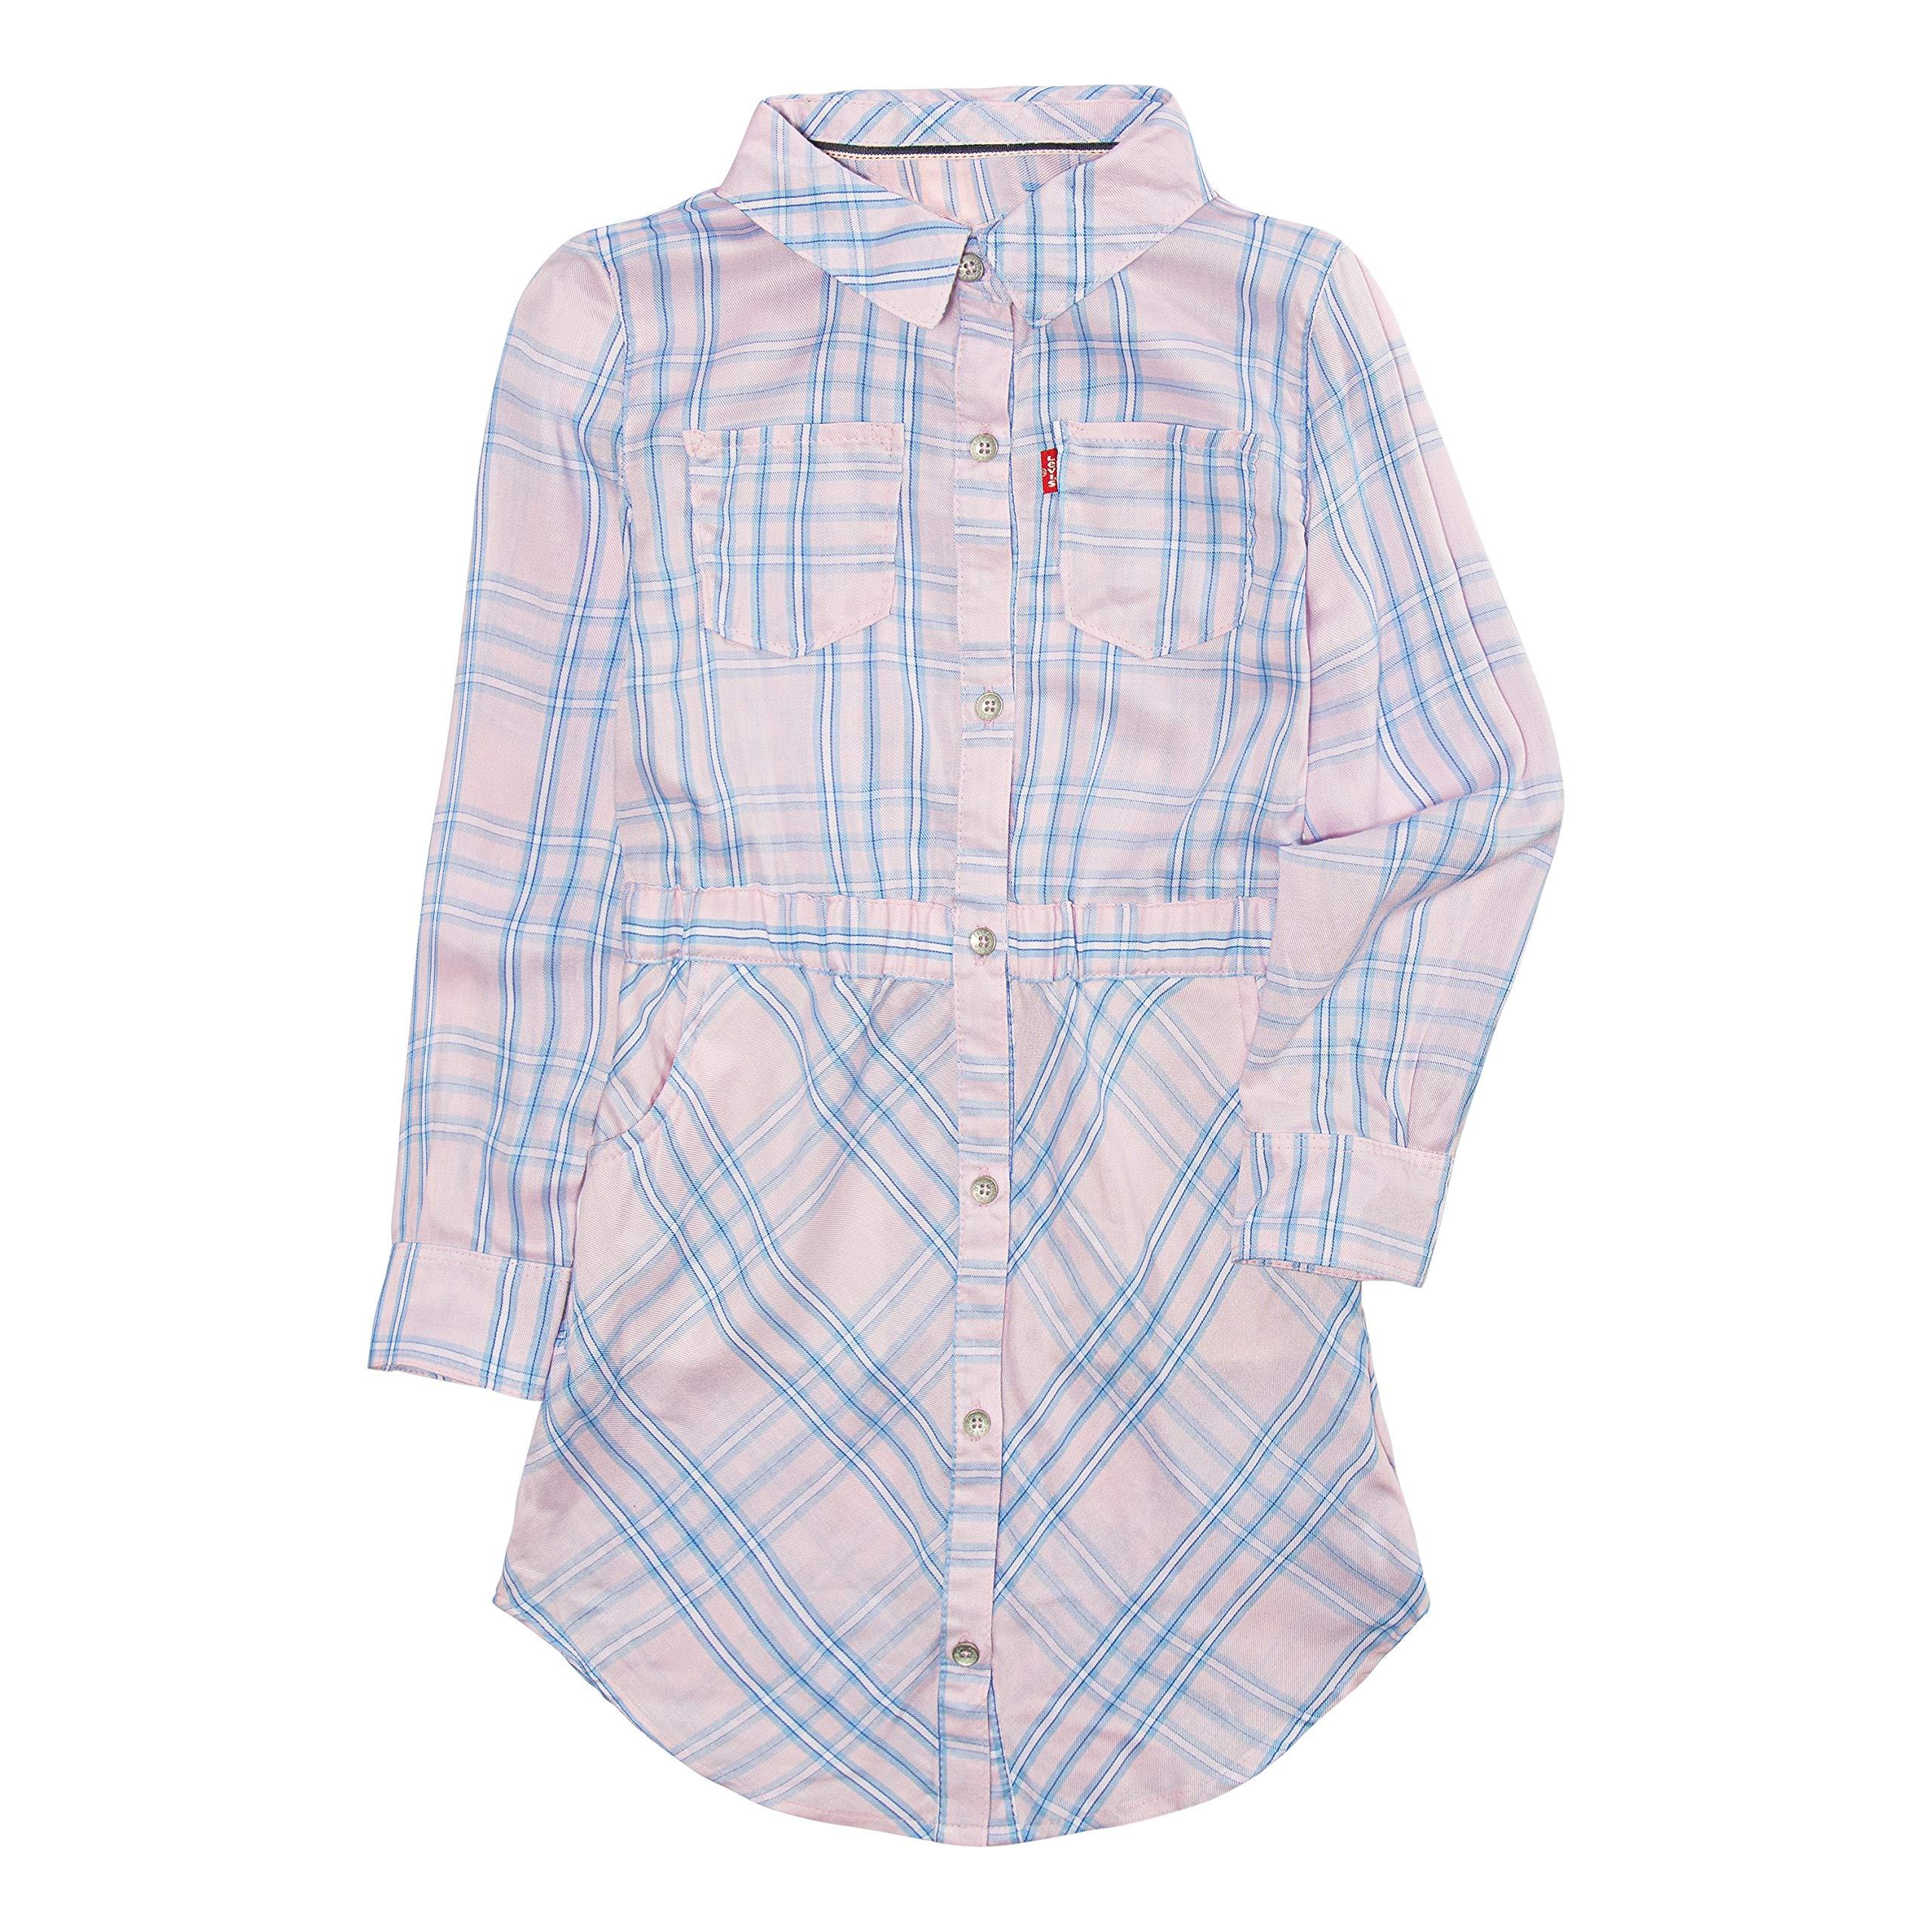 8863774ca Galleon - Levi's Girls' Toddler Long Sleeve Western Dress, Cyclamen/Powder  Blue, 3T